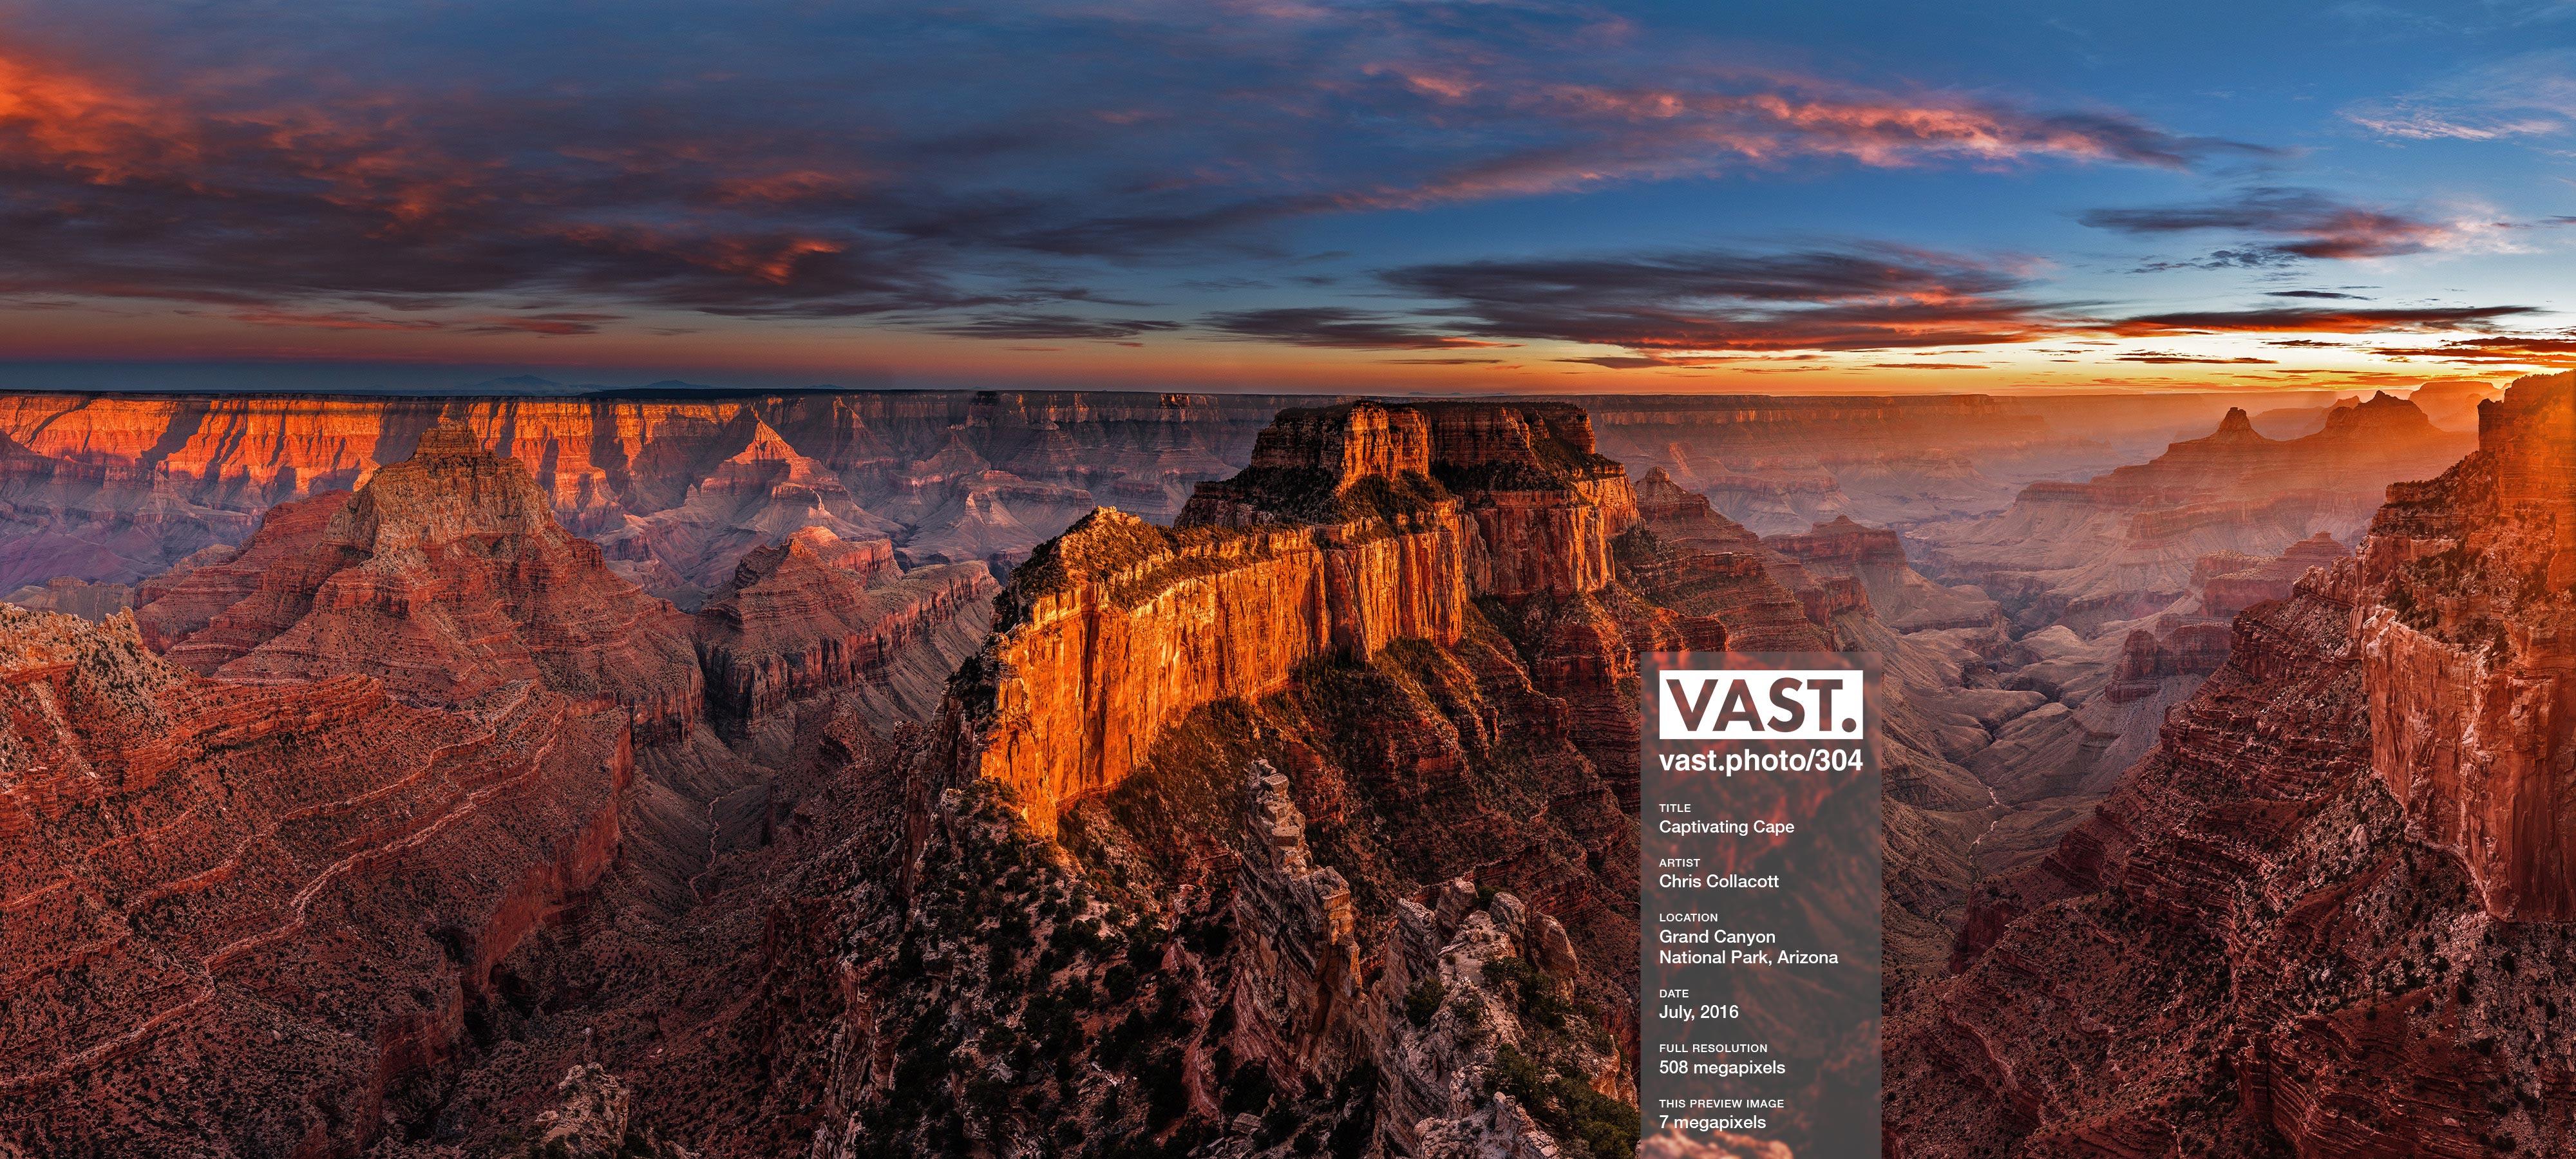 High Resolution Grand Canyon Photos & Large-Format Prints - VAST